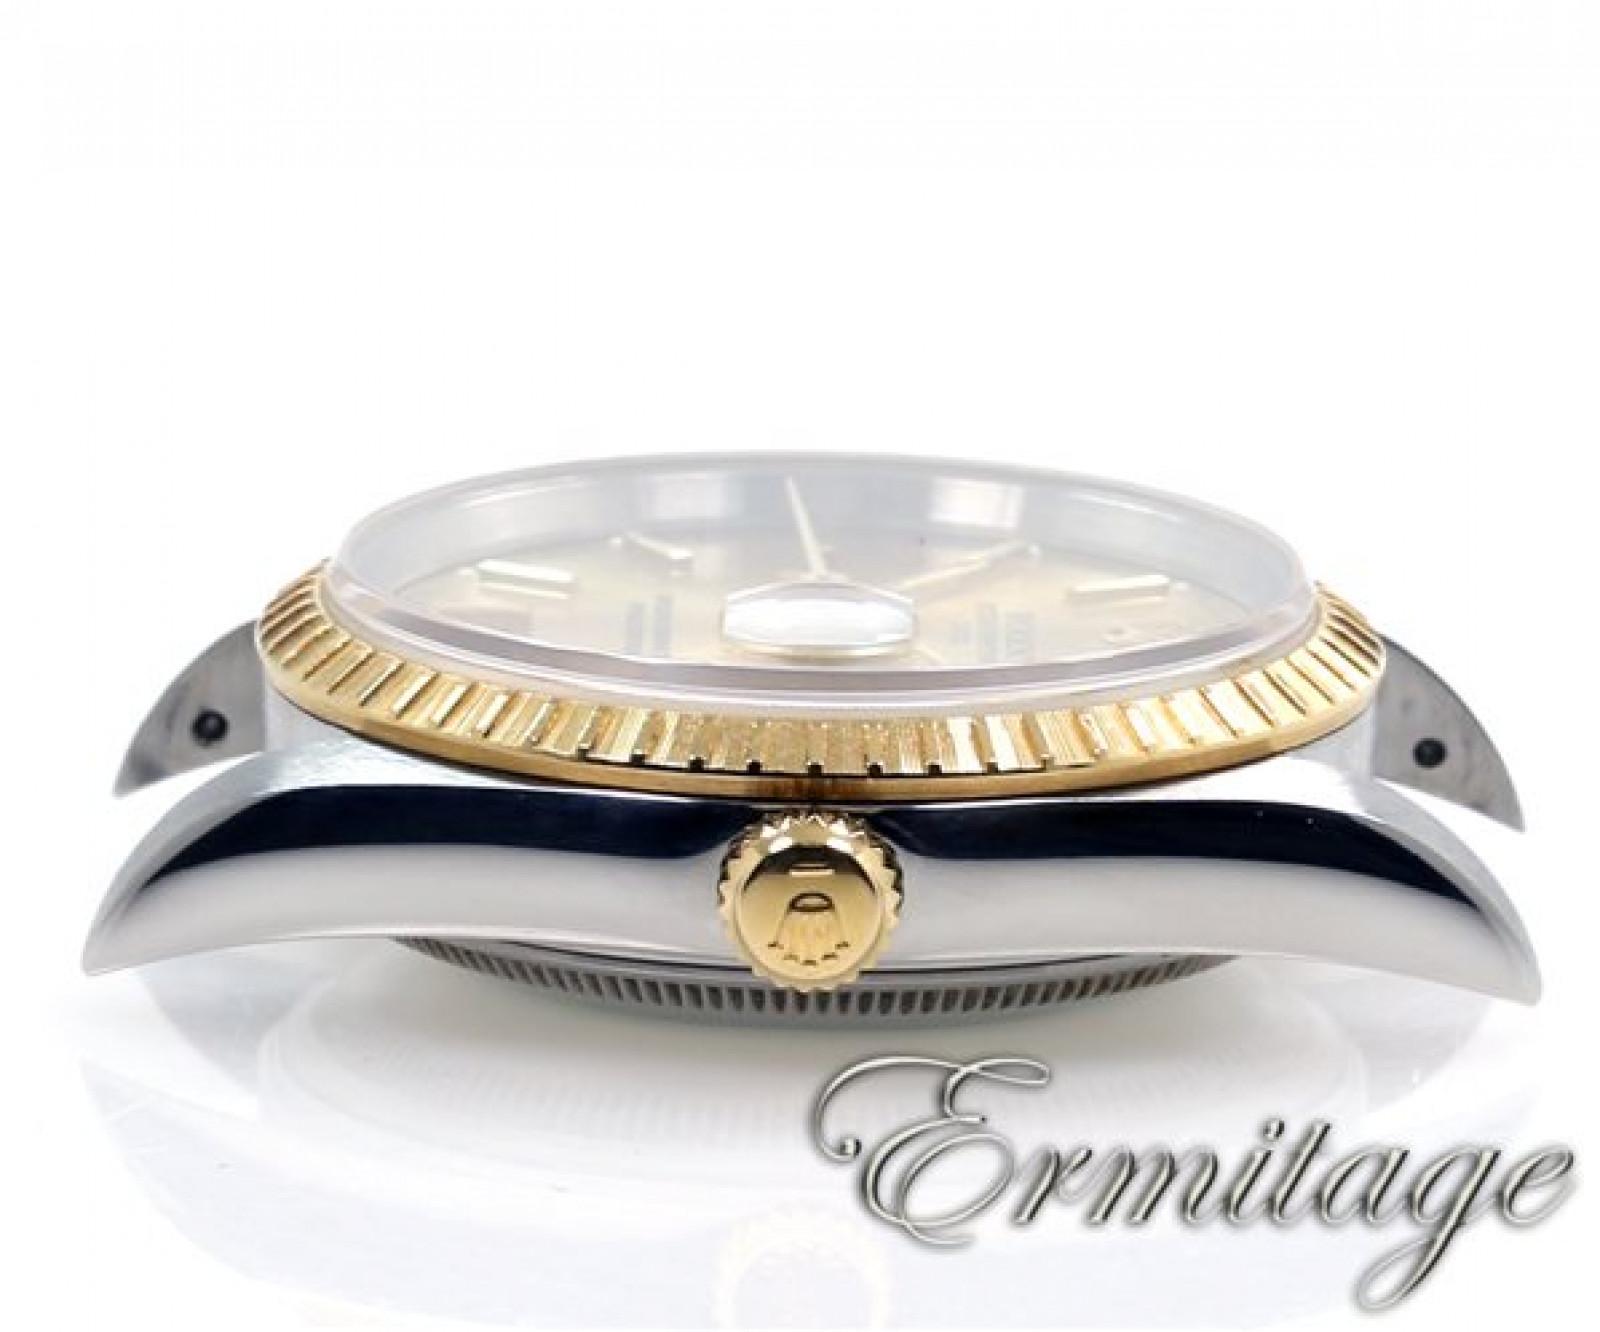 Rolex Date 15223 Gold & Steel Champagne 1994